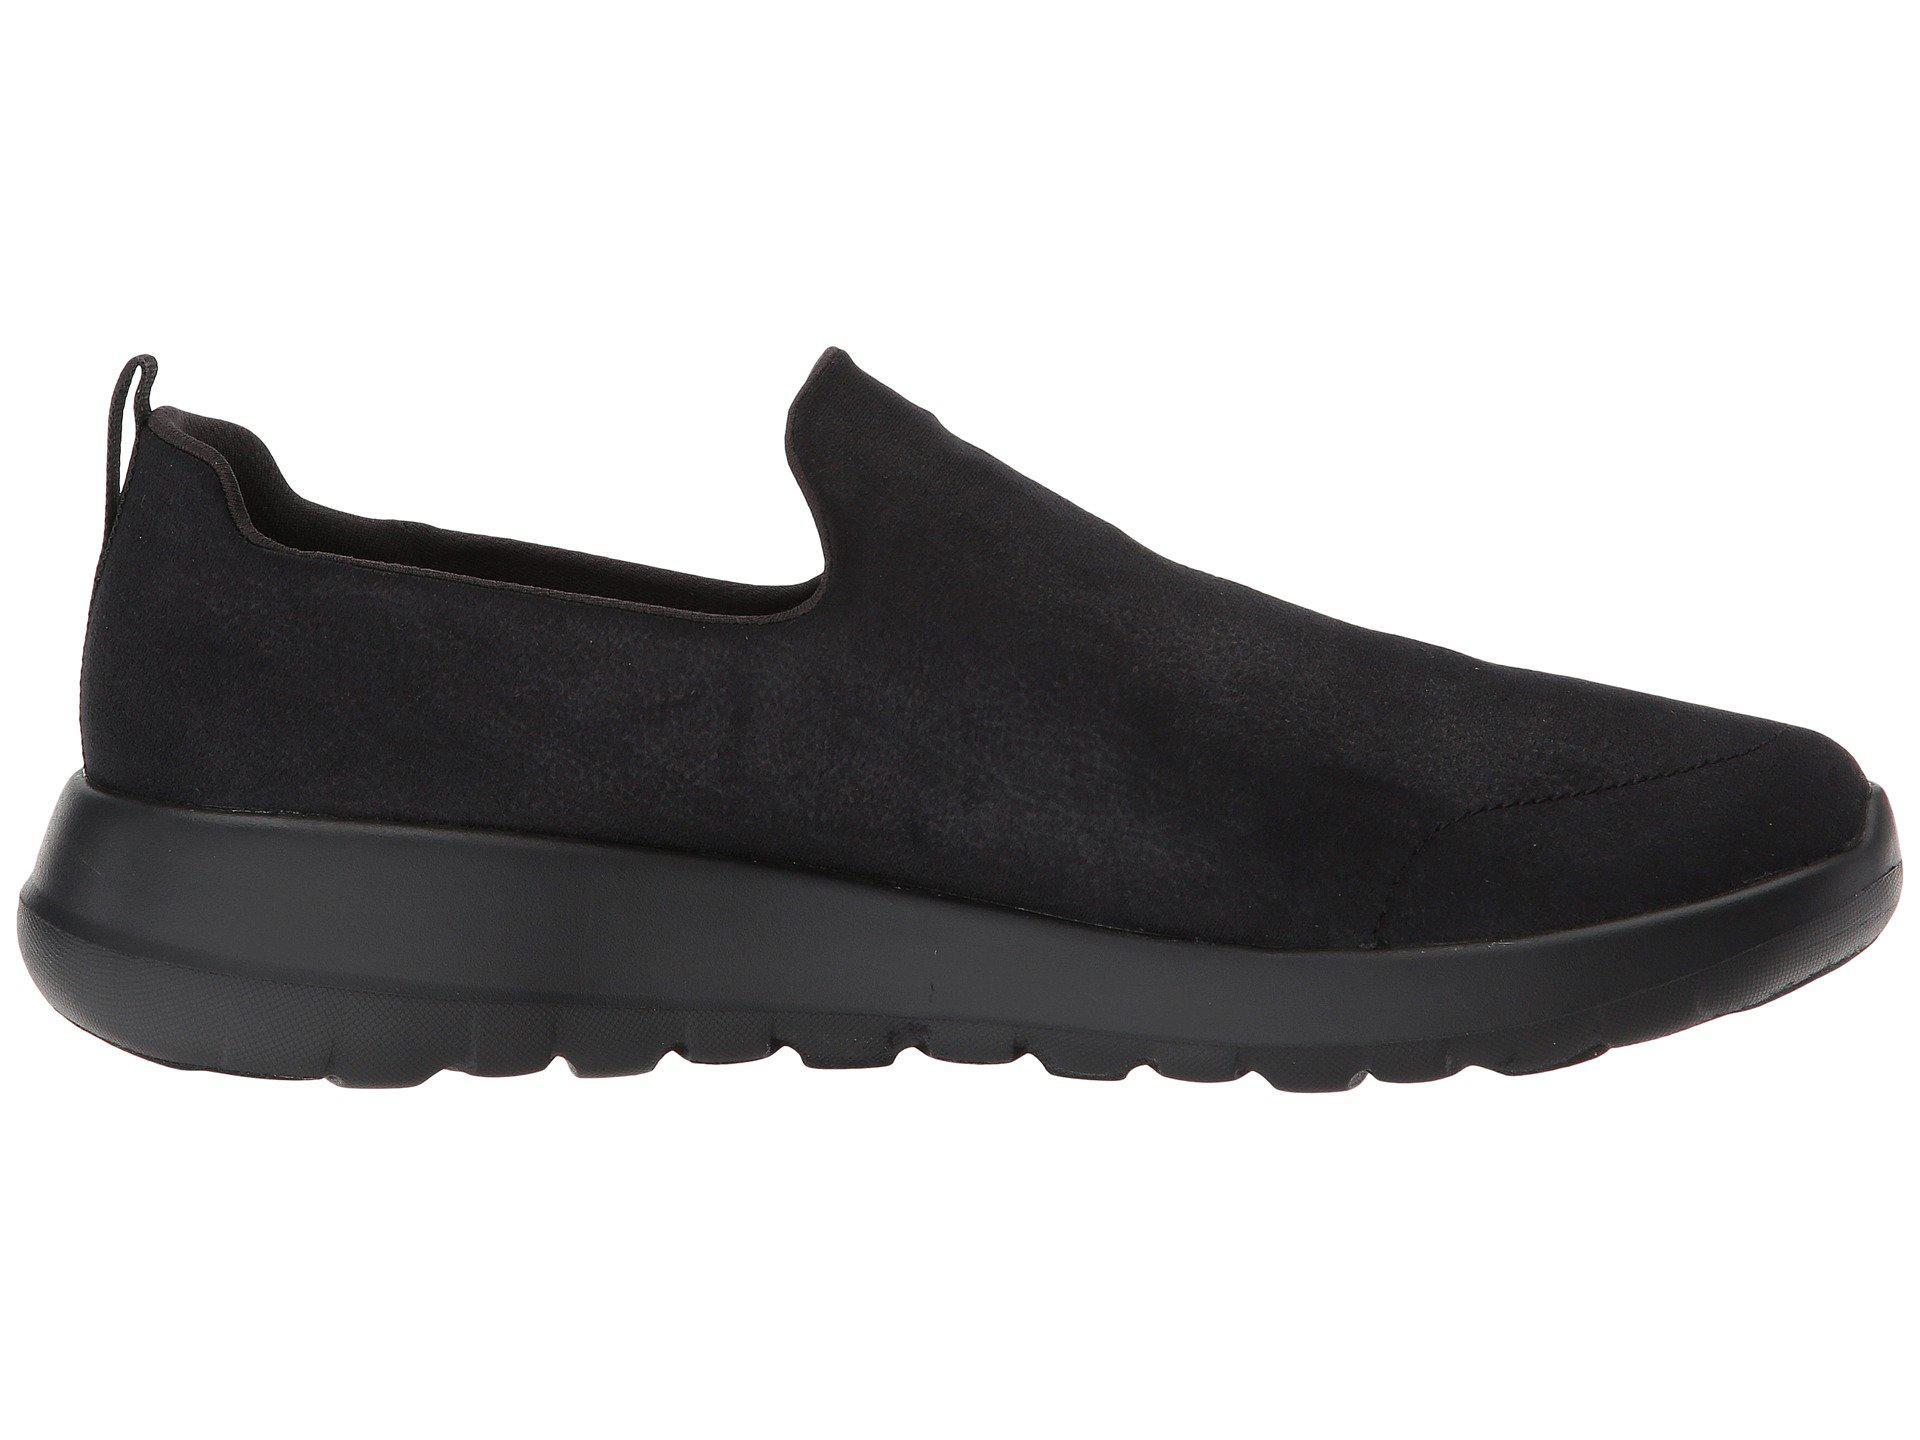 Skechers Leather Gowalk Max - Escalate